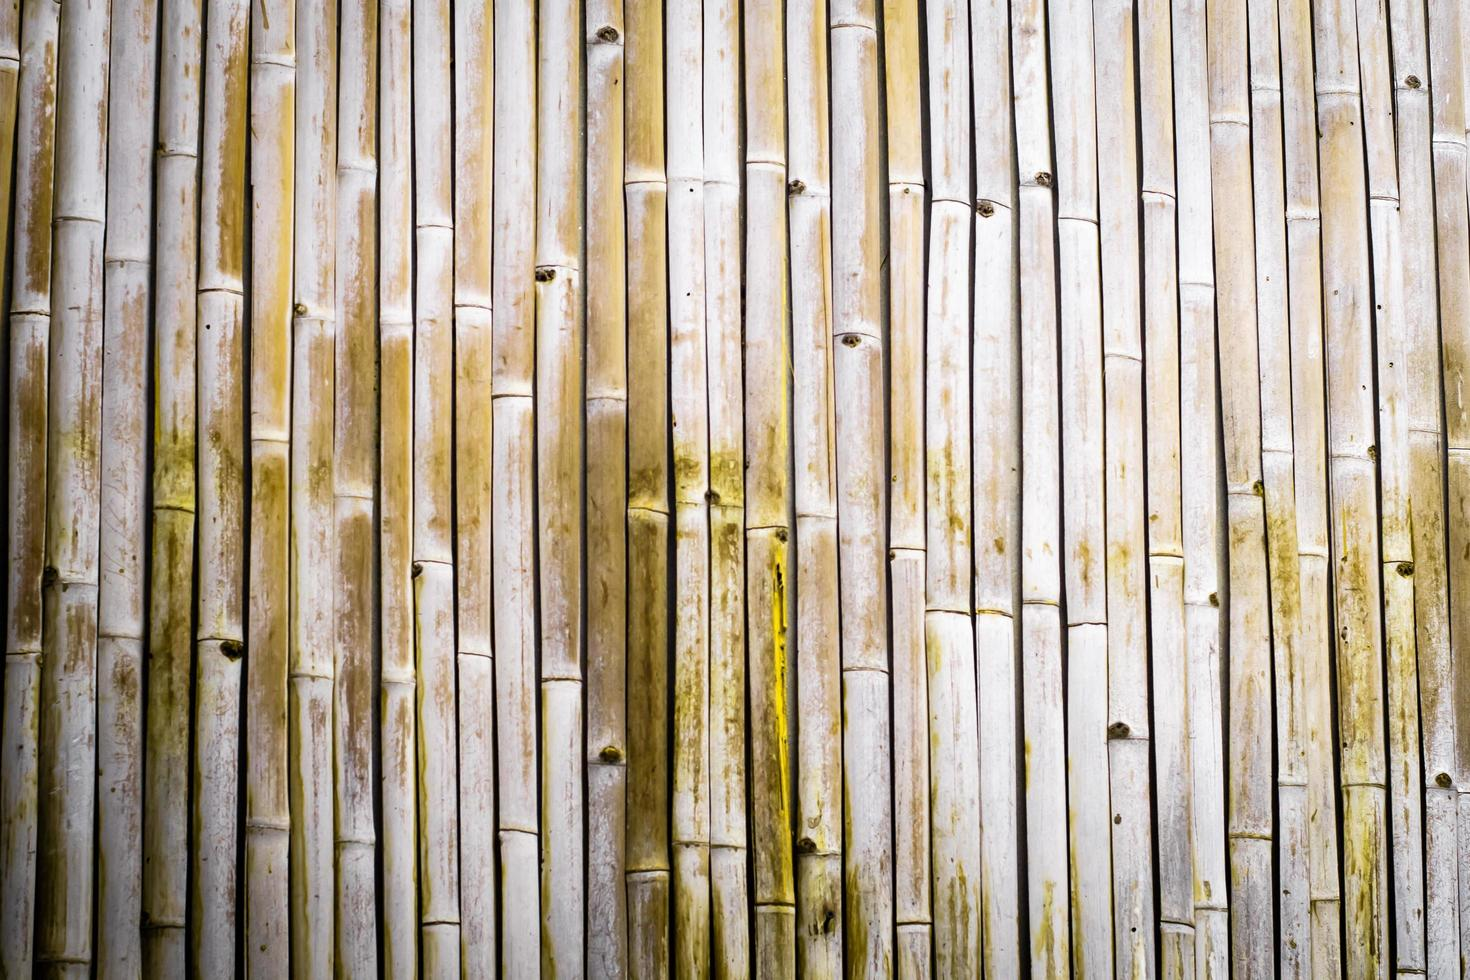 textura de bambú seco foto